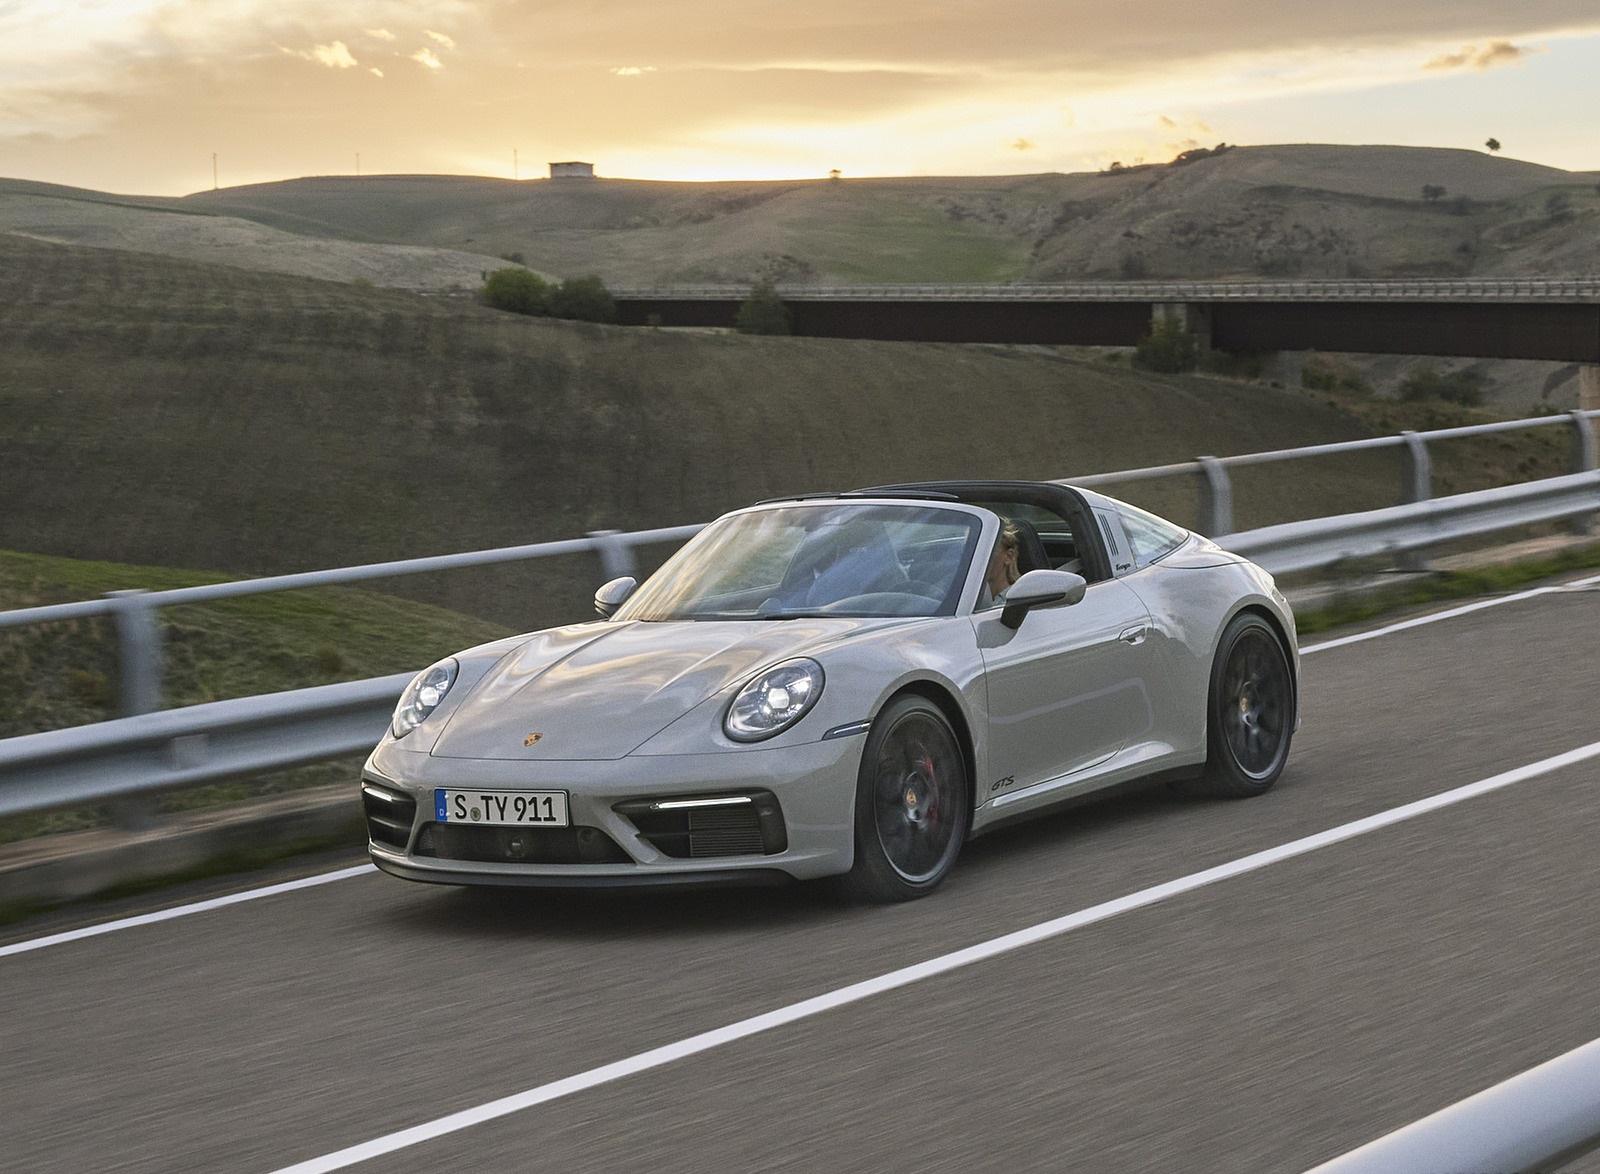 2022 Porsche 911 Targa 4 GTS Front Three-Quarter Wallpapers  (2)